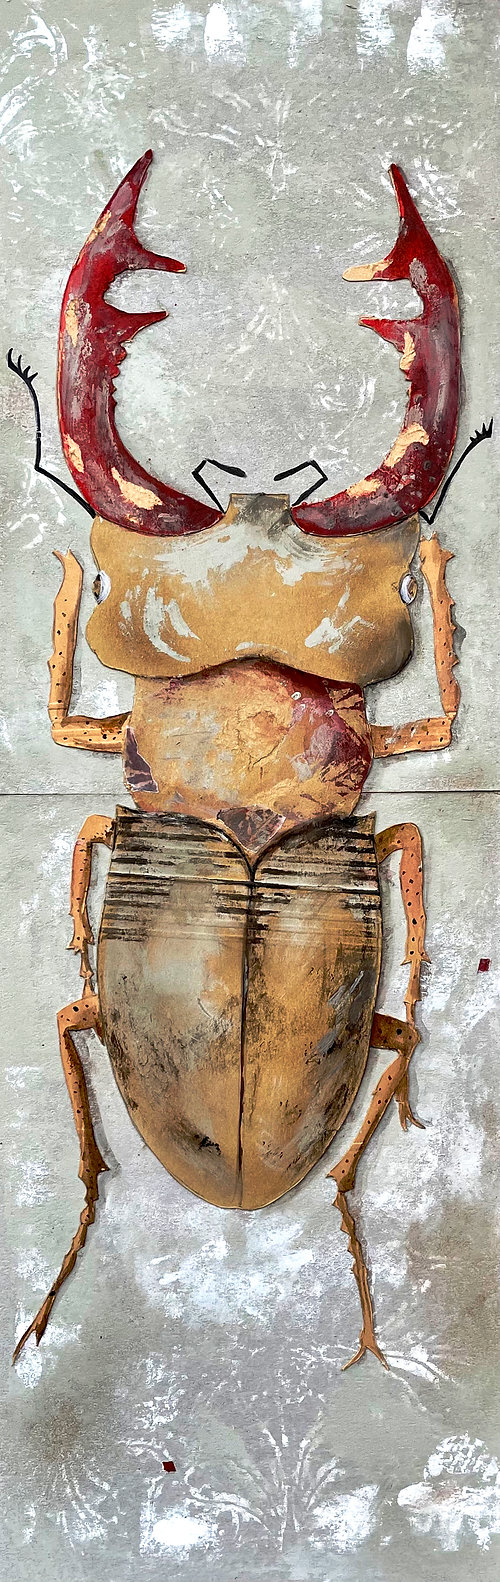 Winterbeetle, a collage by Bärbel Thiel